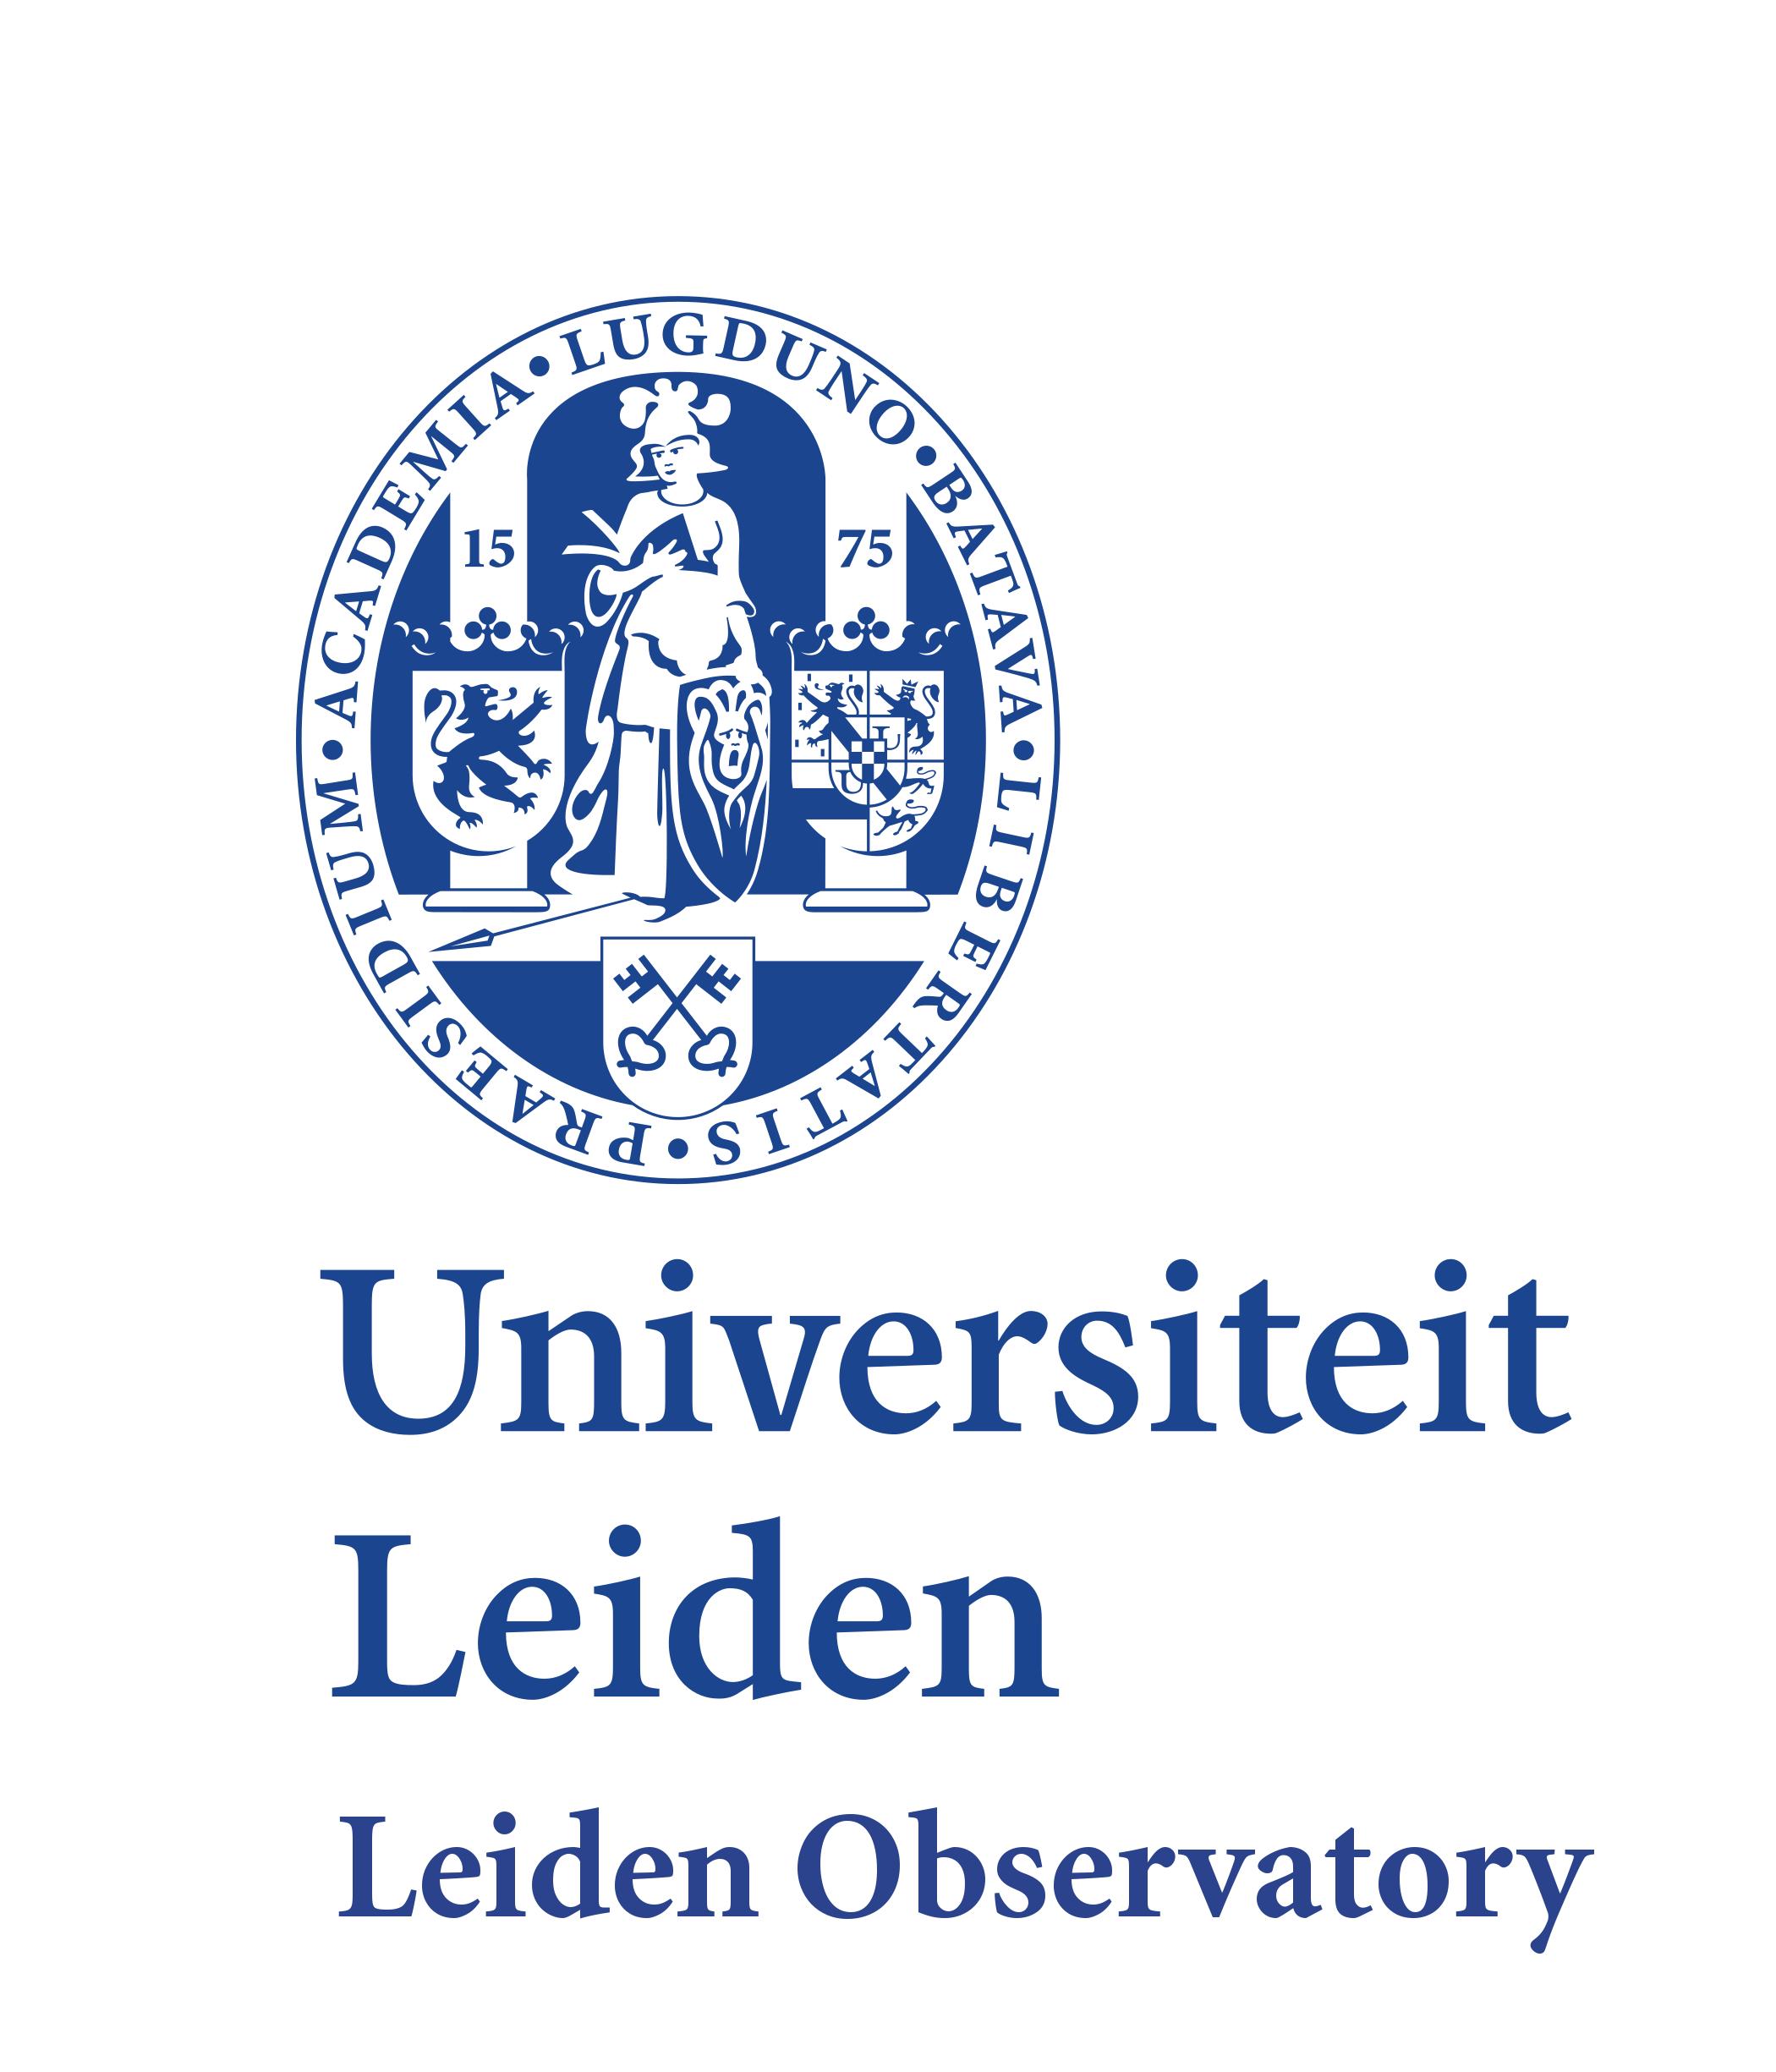 Leiden Observatory - Leiden University